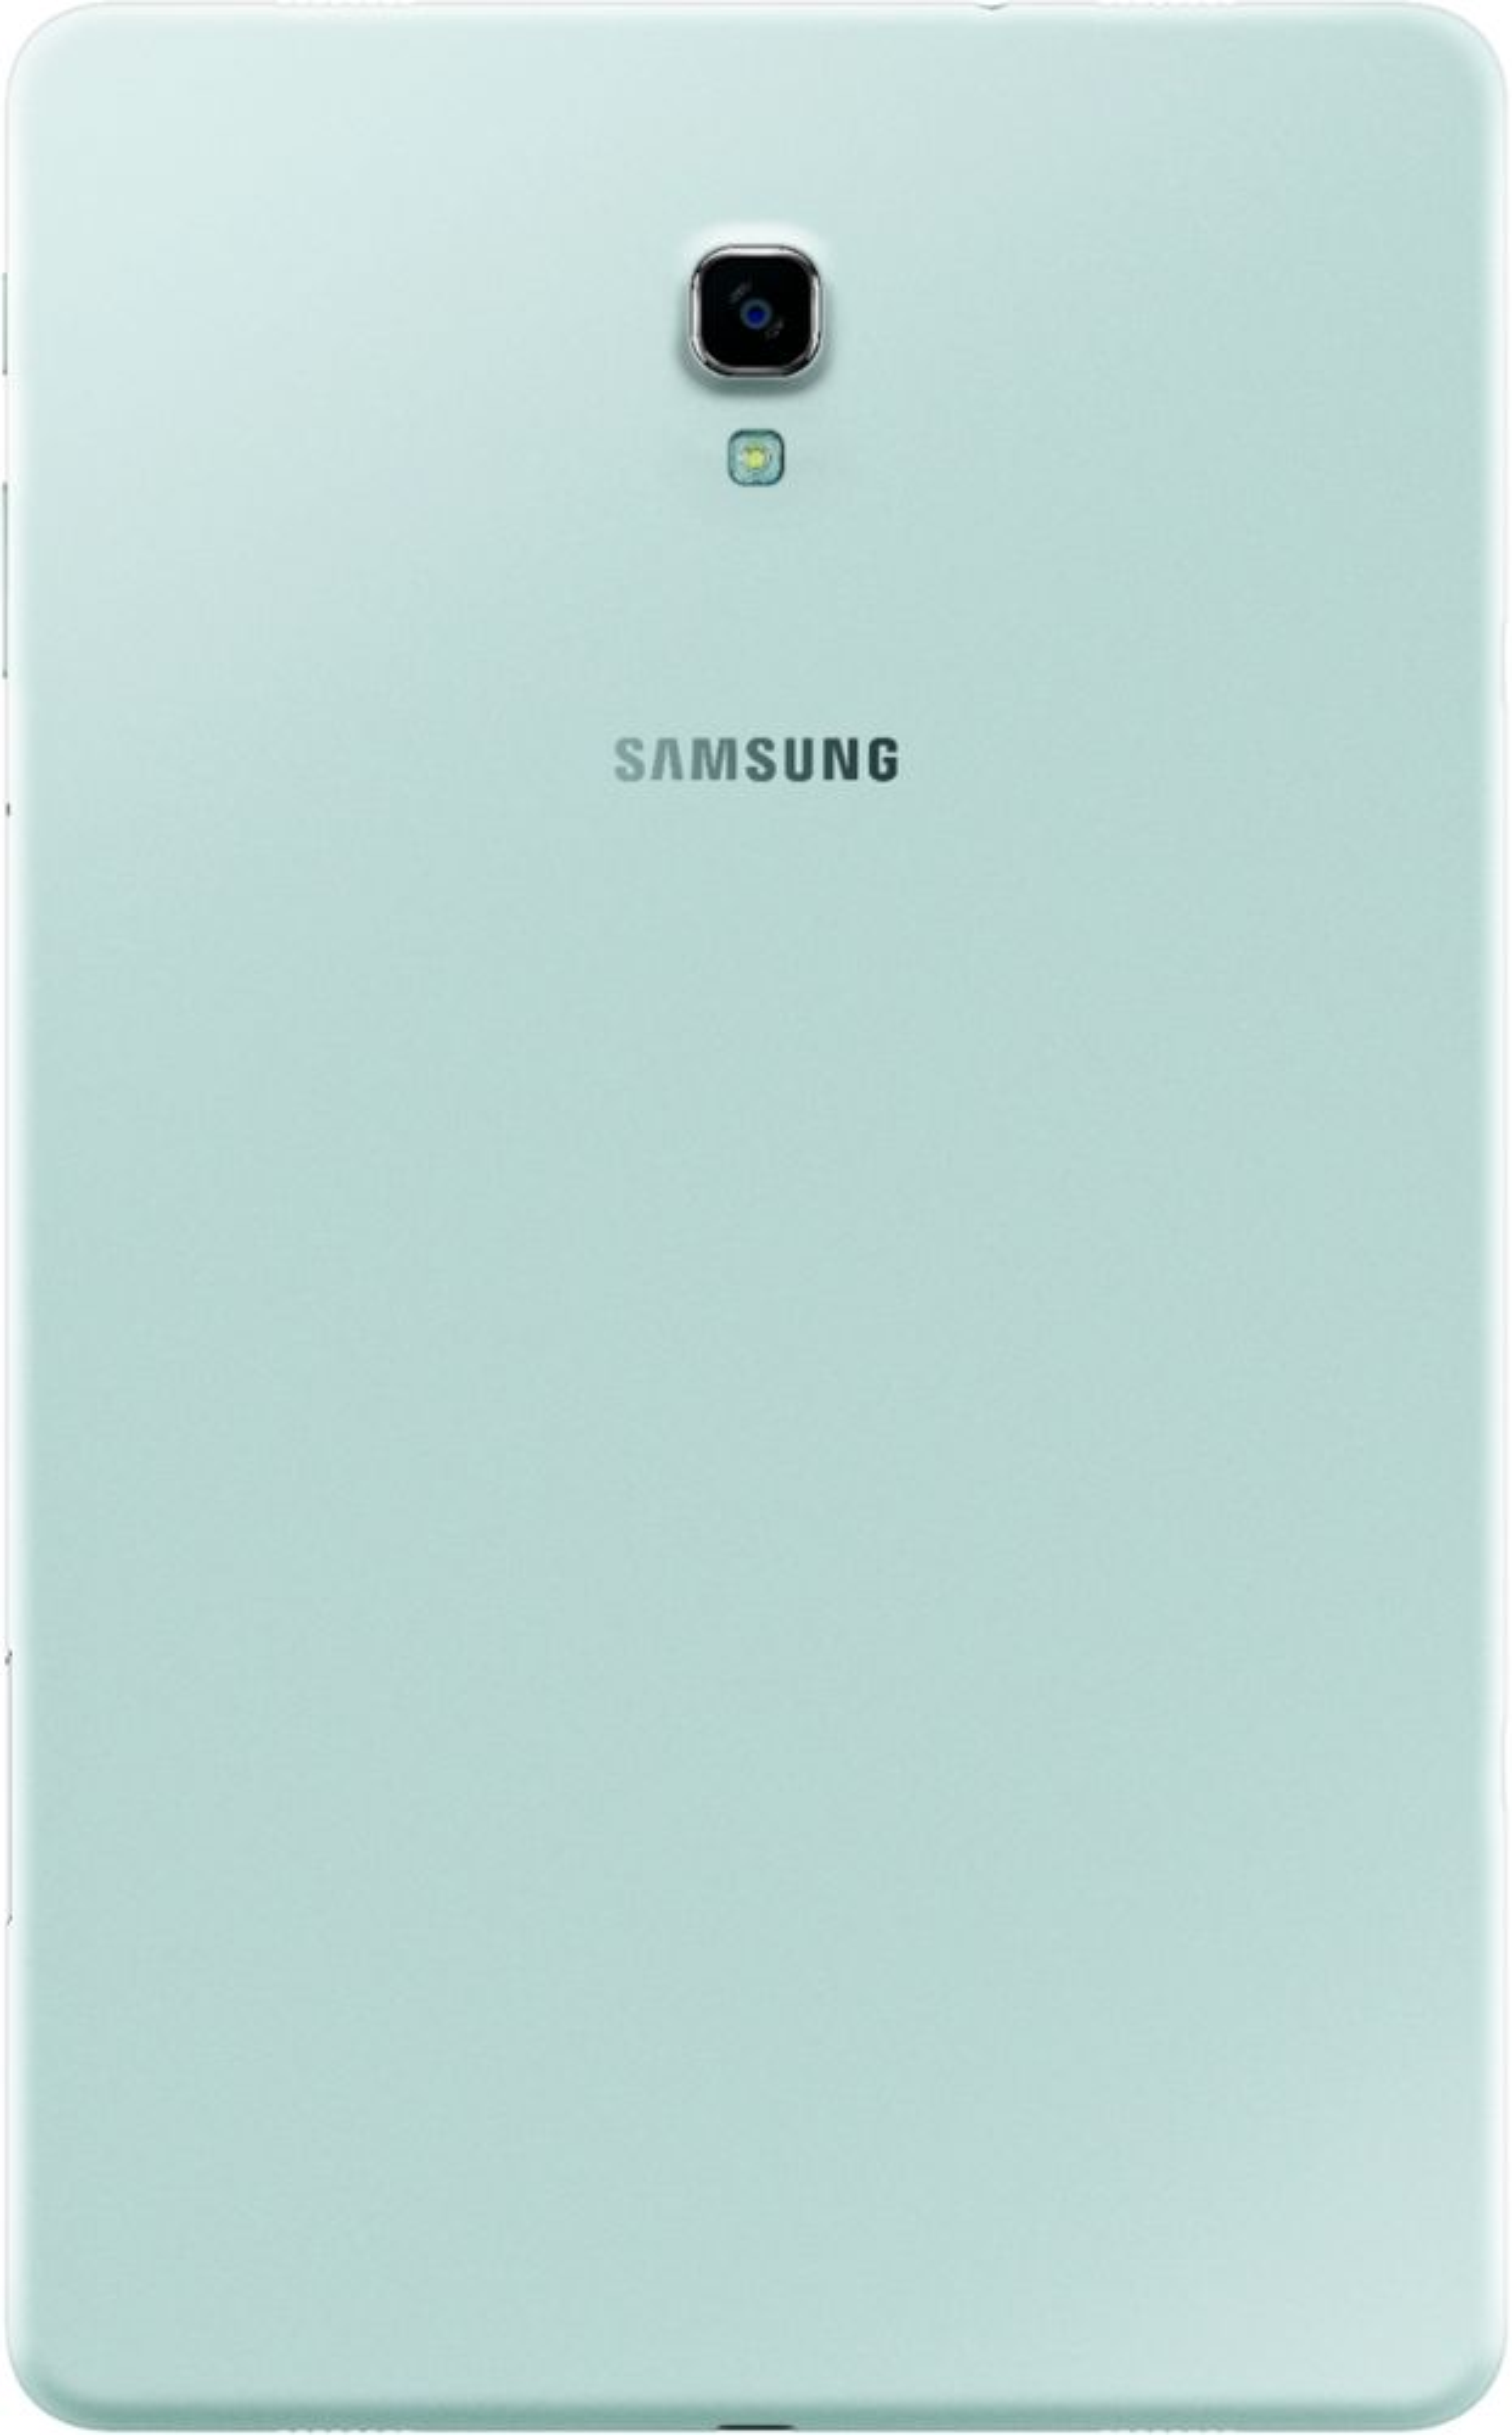 Samsung SM-T590NZAAXAR backViewImage